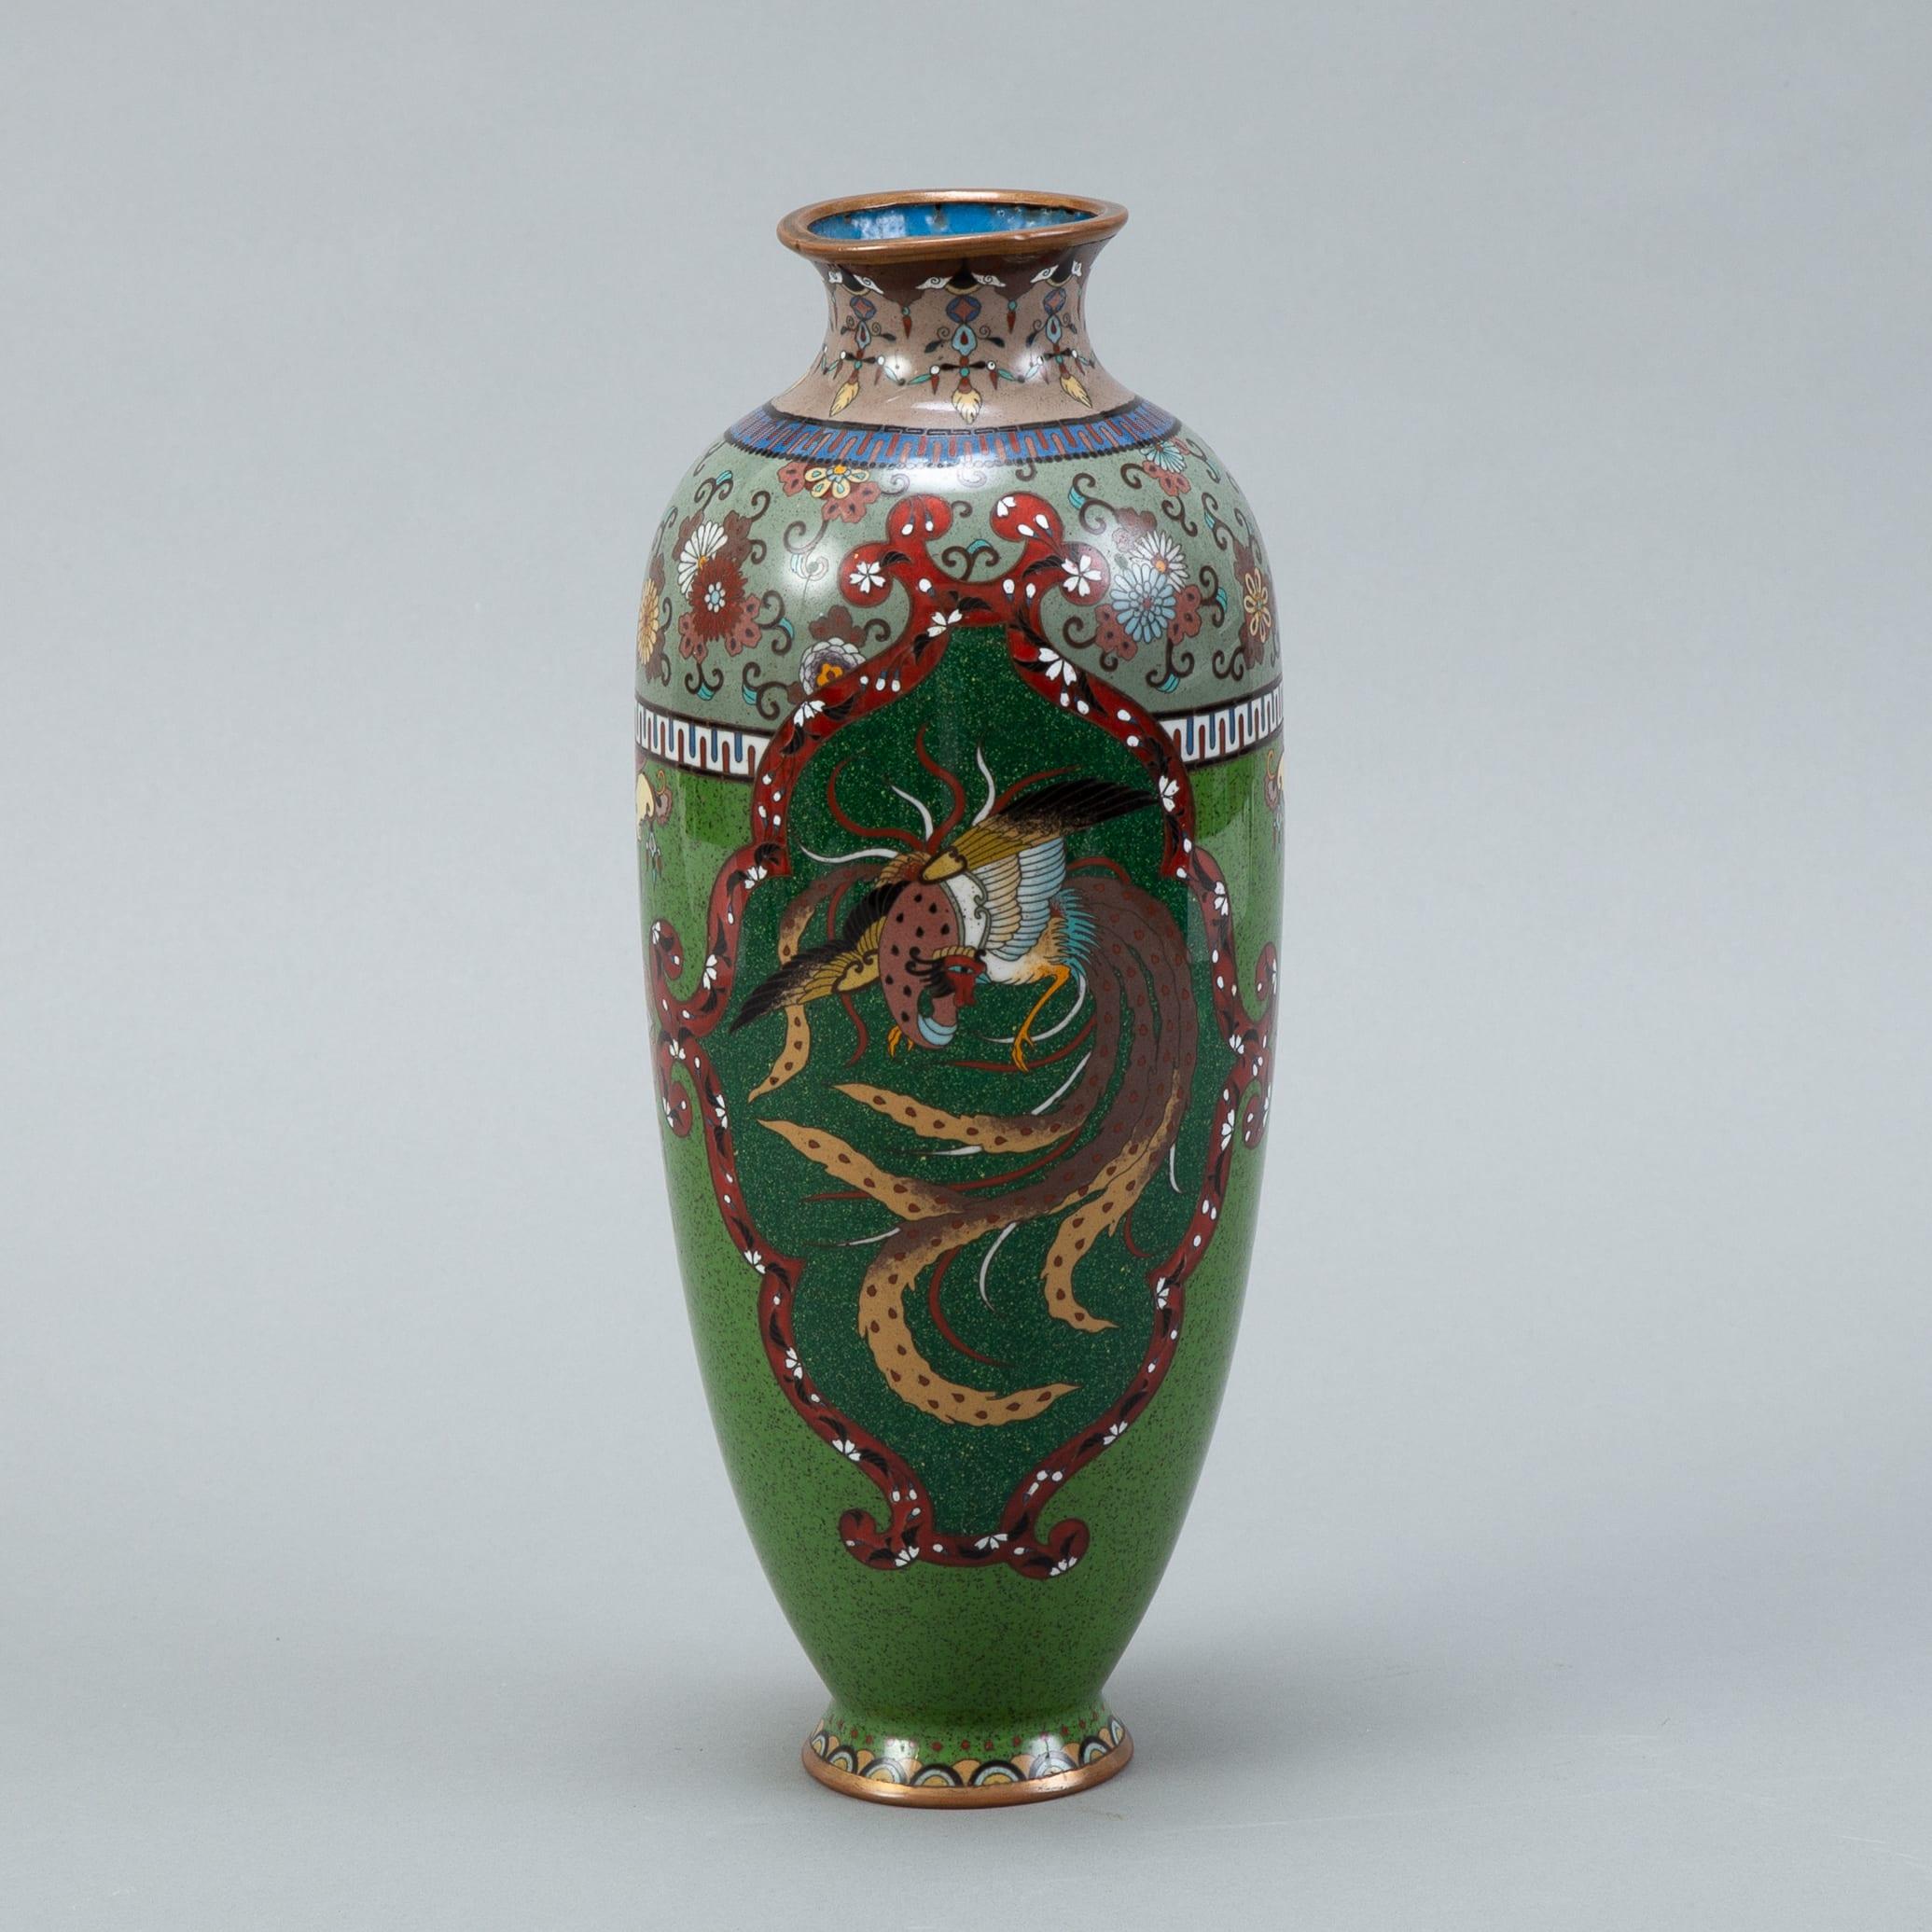 Lot 012: Japanese Meiji Cloisonne Vase - Phoenix